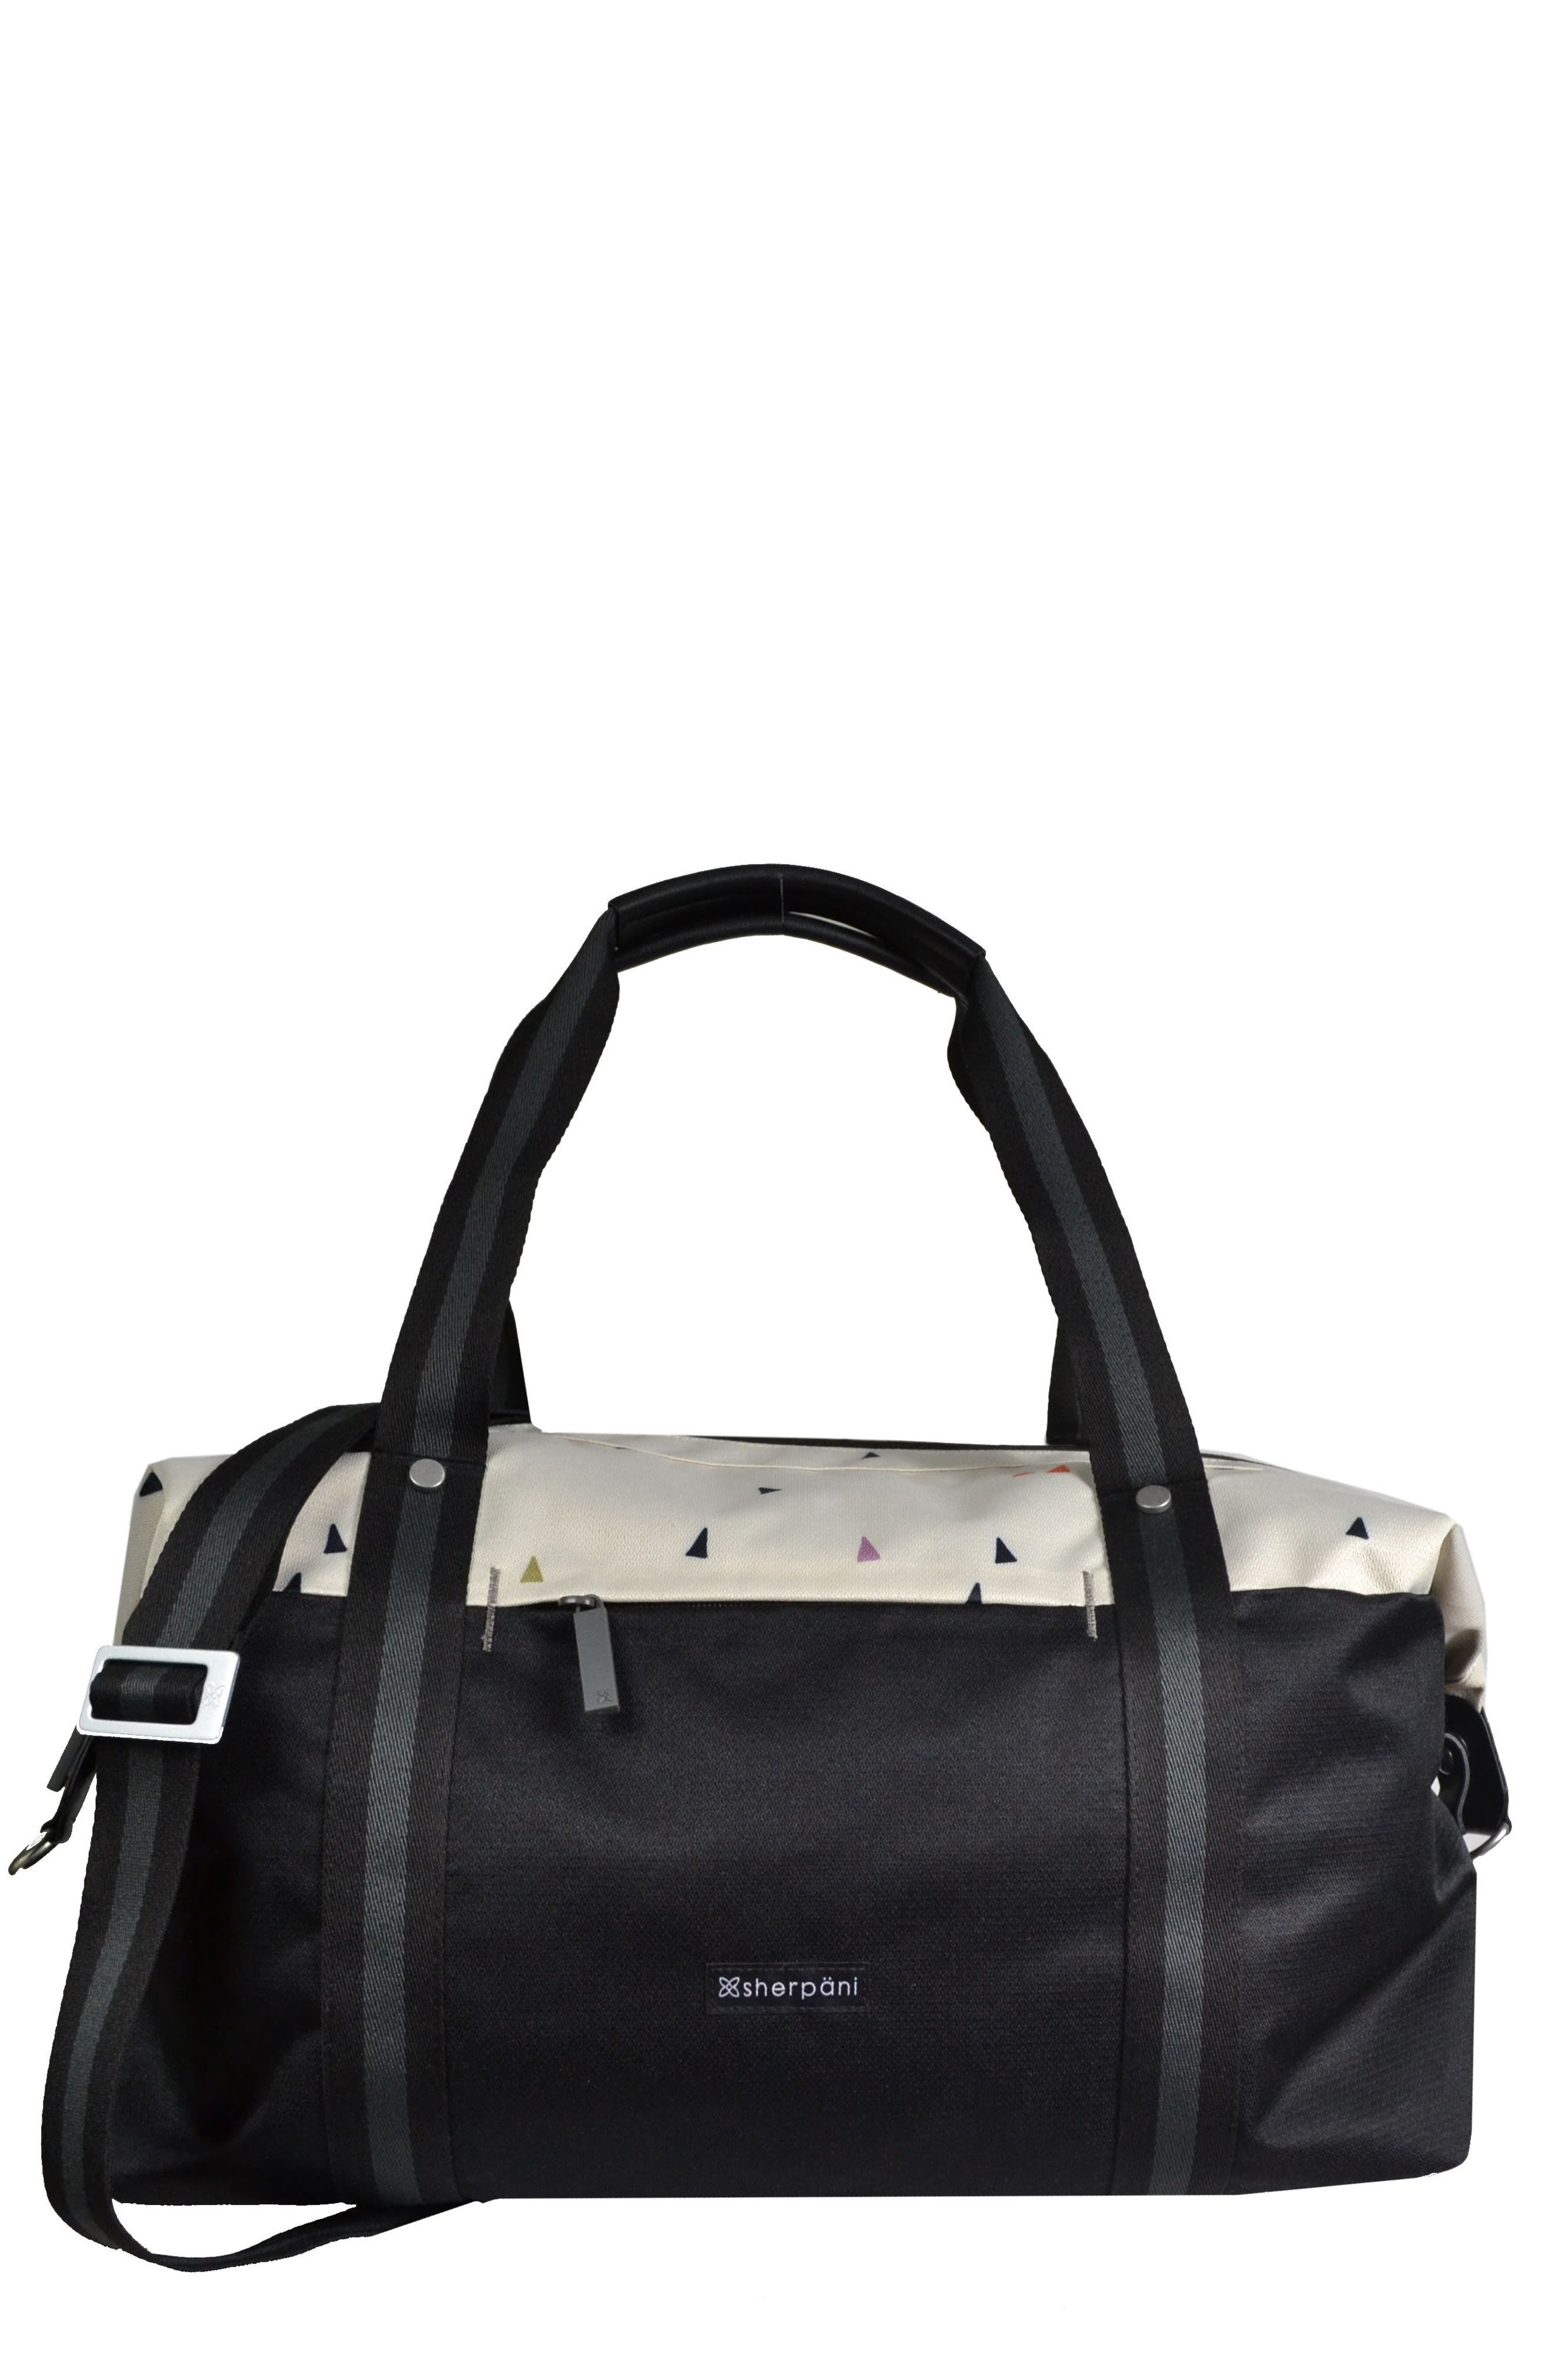 Alternate Image 1 Selected - Sherpani Finn Overnighter Duffel Bag